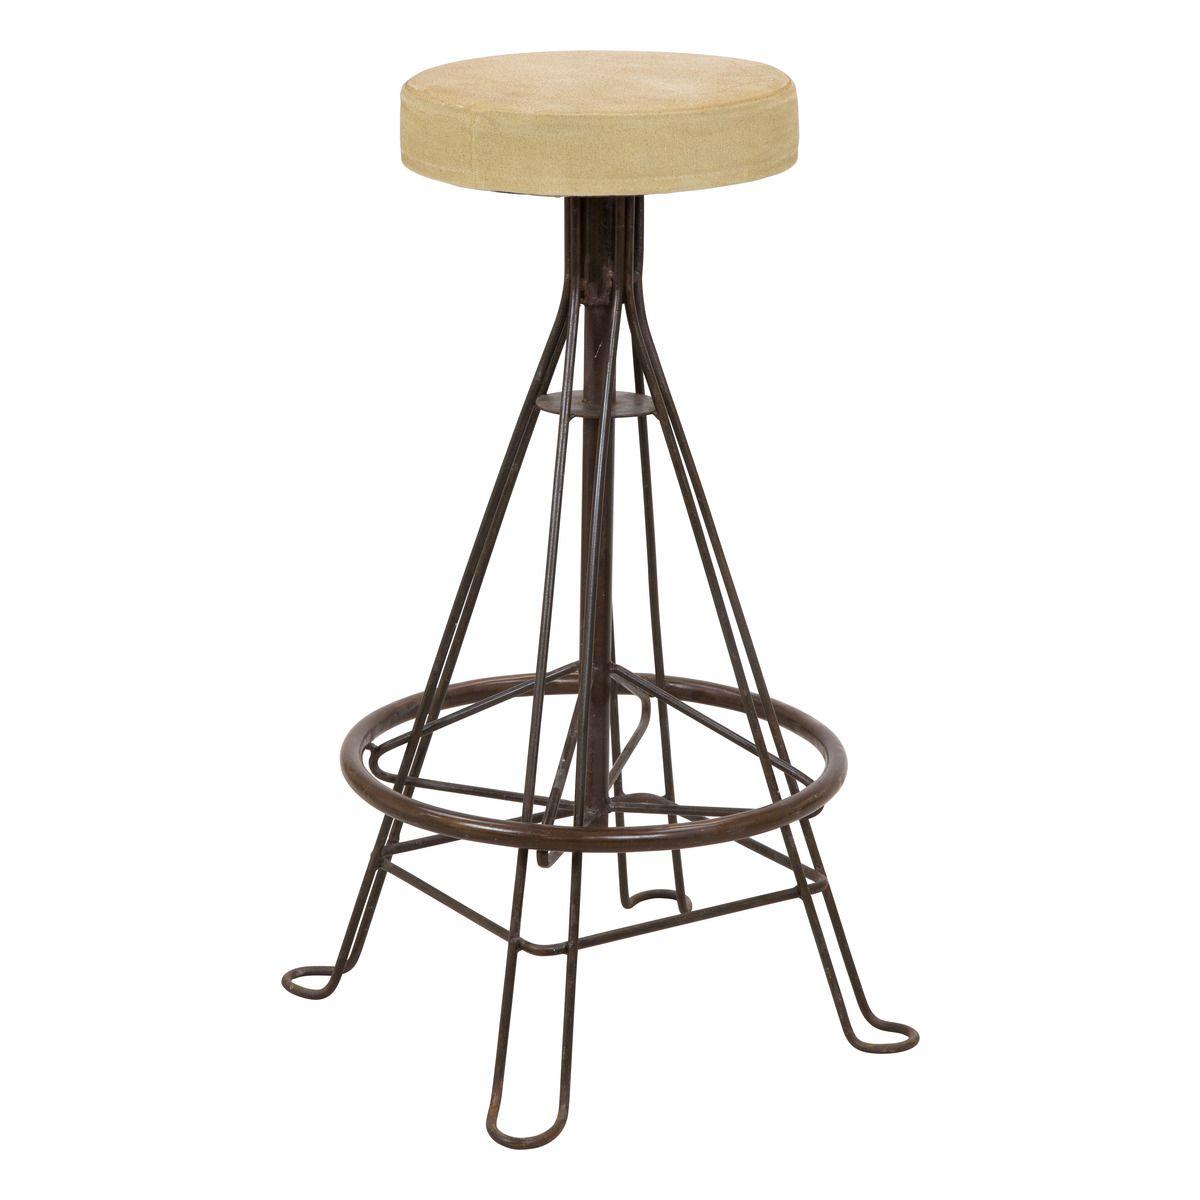 Eiffel Canvas & Iron Bar Stool // Rustic & Industrial Styled Furniture //  Buy